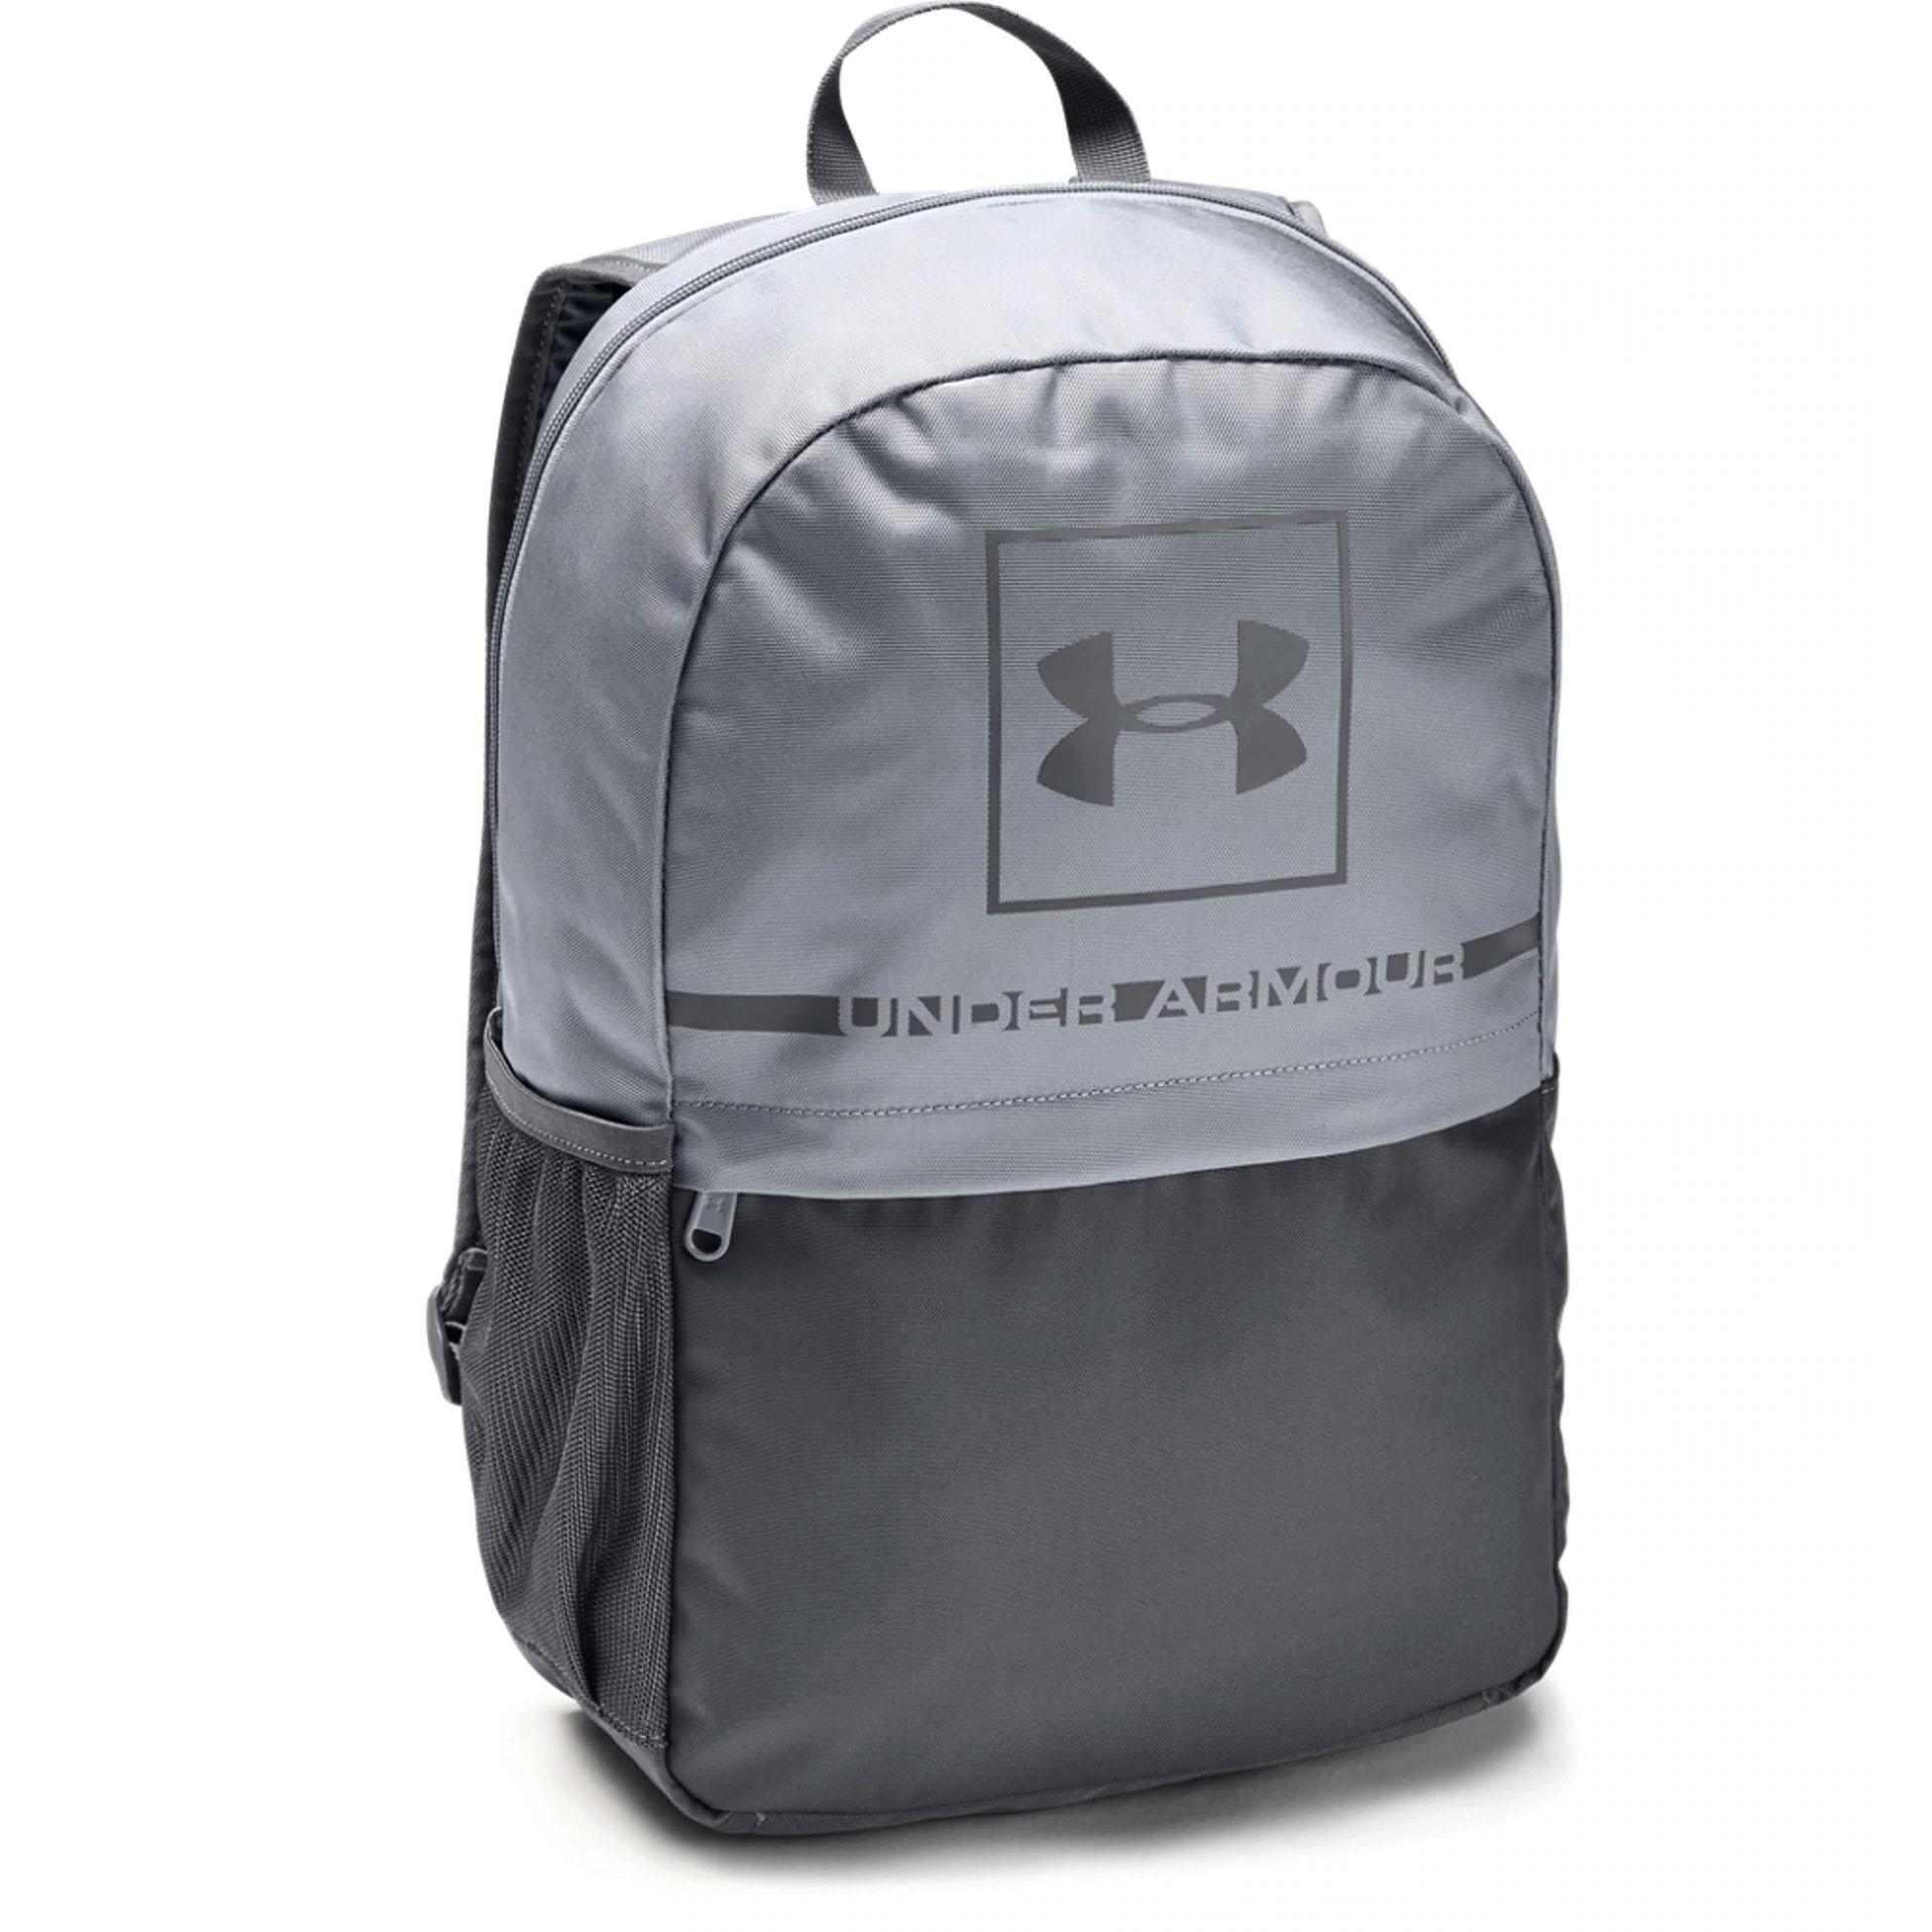 deportiva proyecto mochila la 5 de bolsa mochila armadura gris del Debajo xUA7wIn8qW